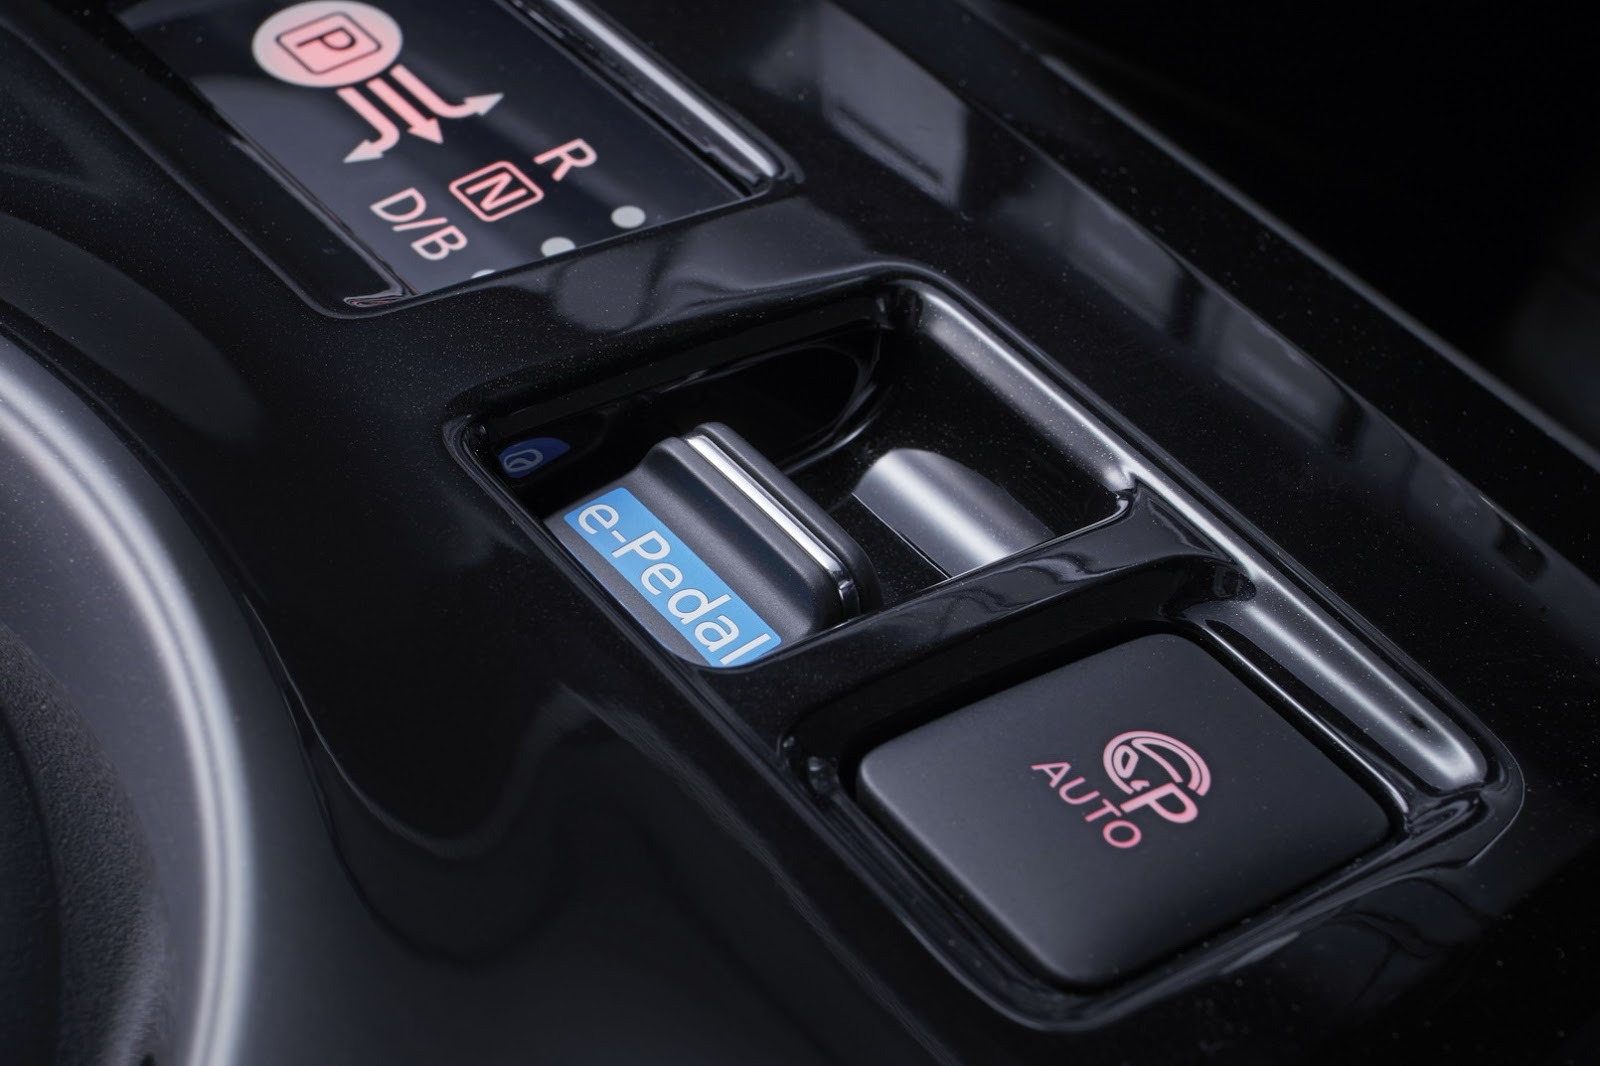 Nissan Leaf 2018 EU (32)